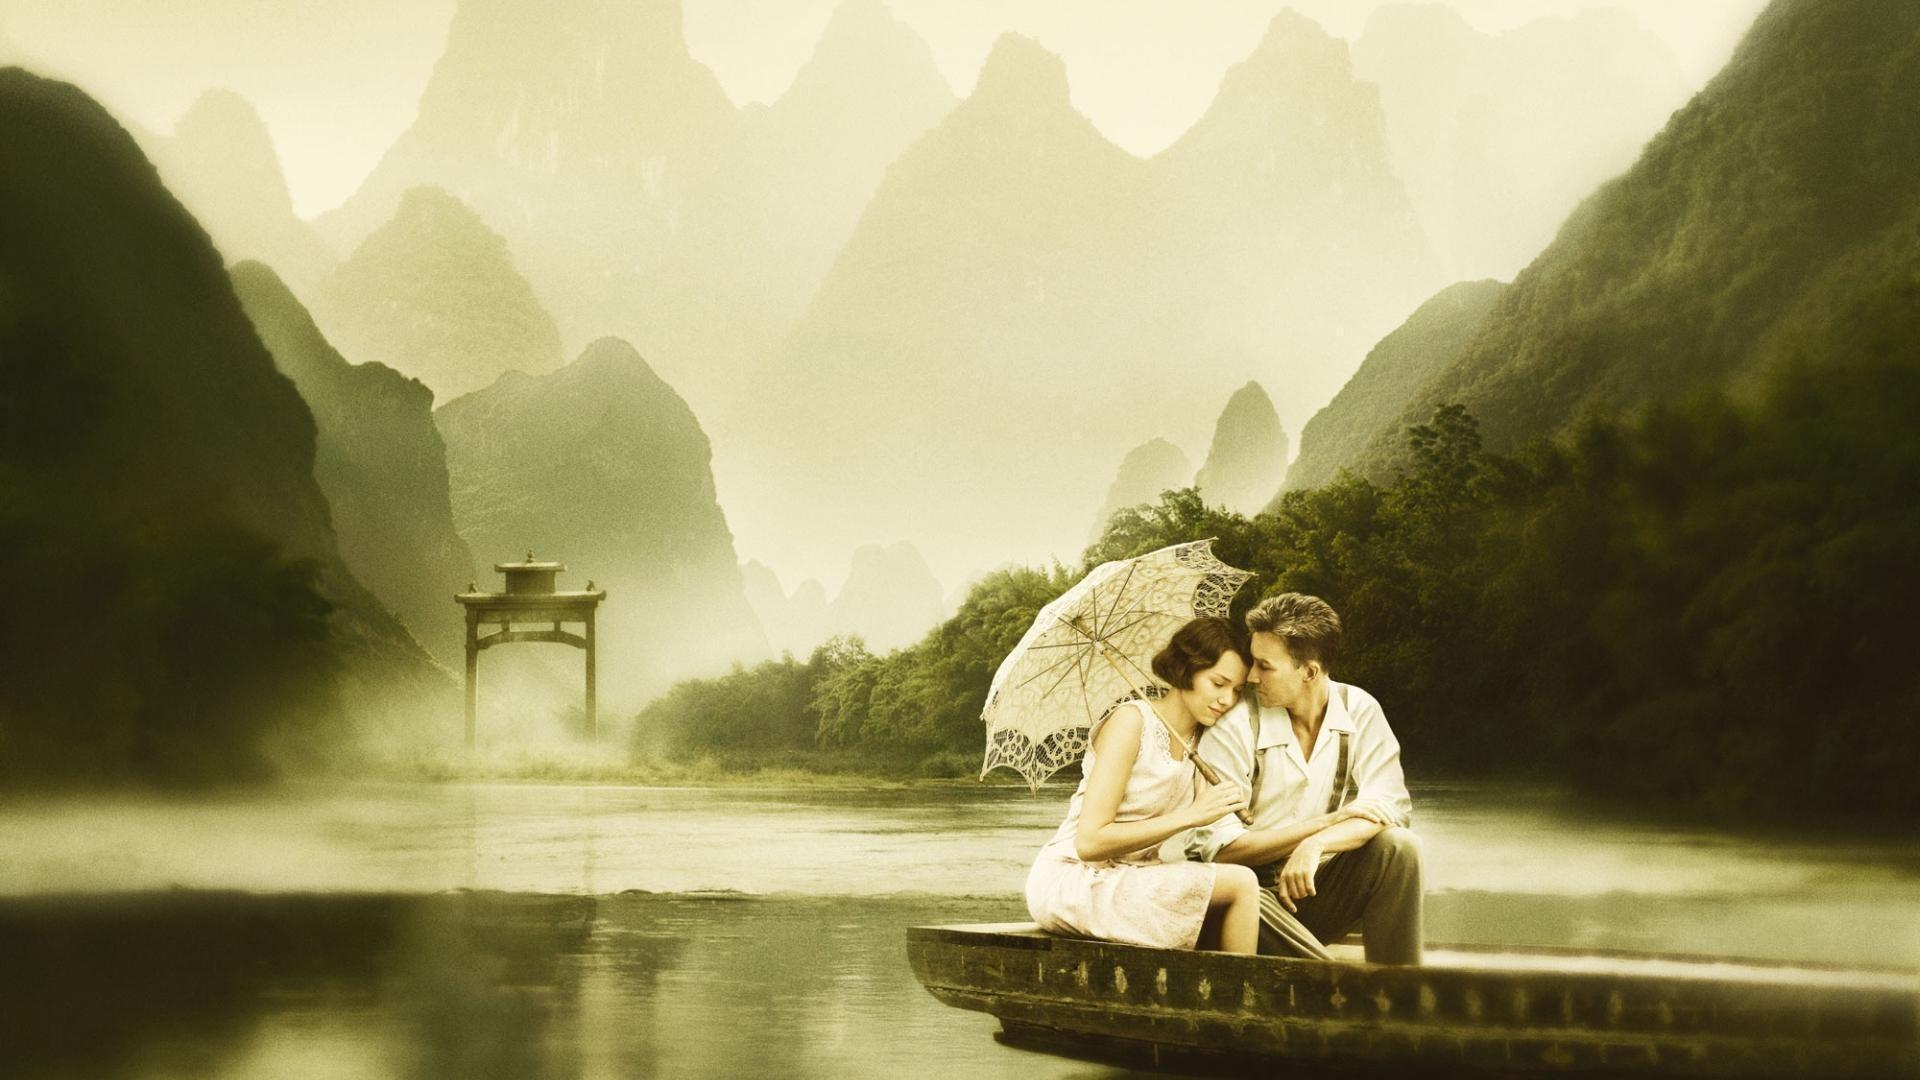 Wallpaper Romantic 70 Images